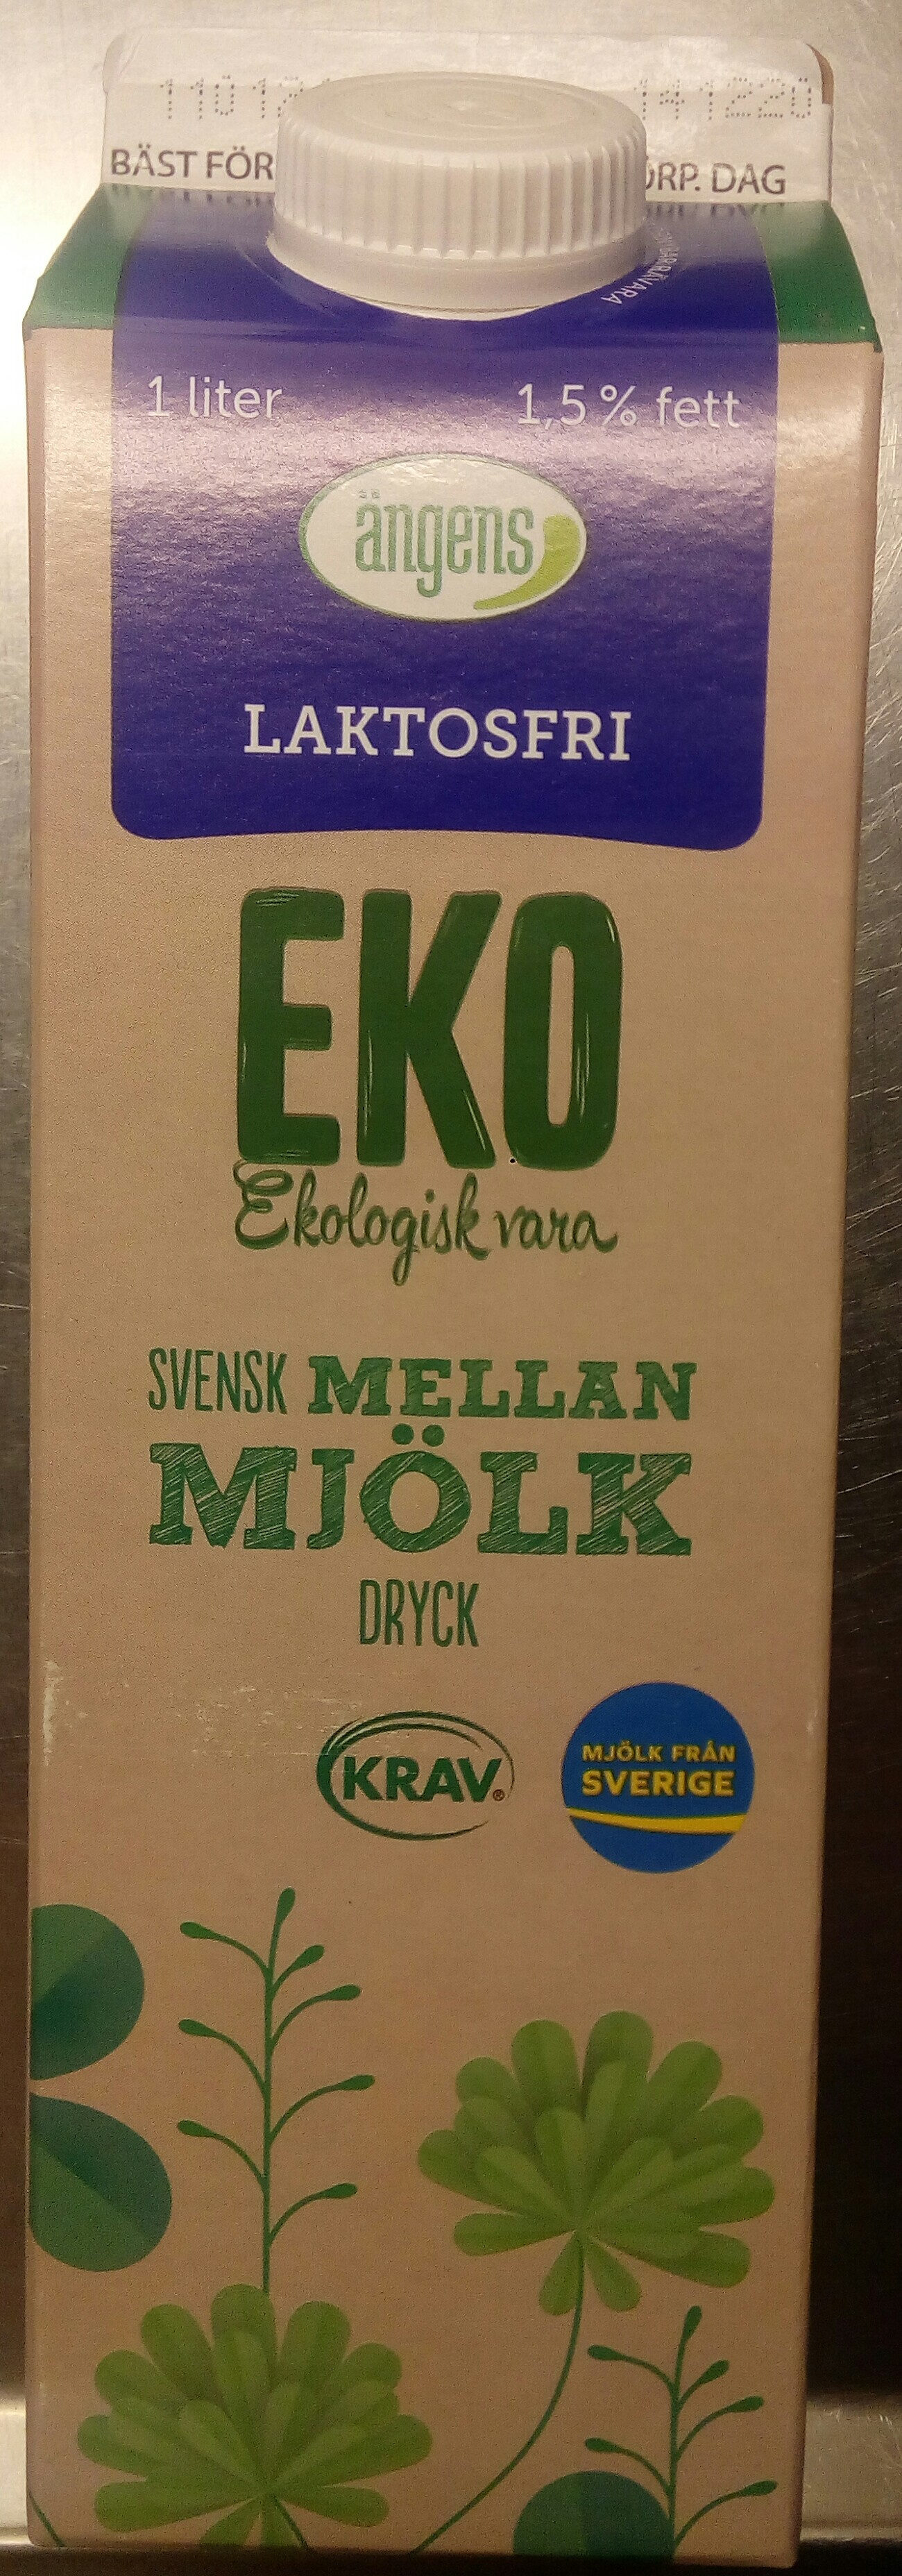 Ängens Laktosfri EKO Svensk mellanmjölkdryck - Produit - sv